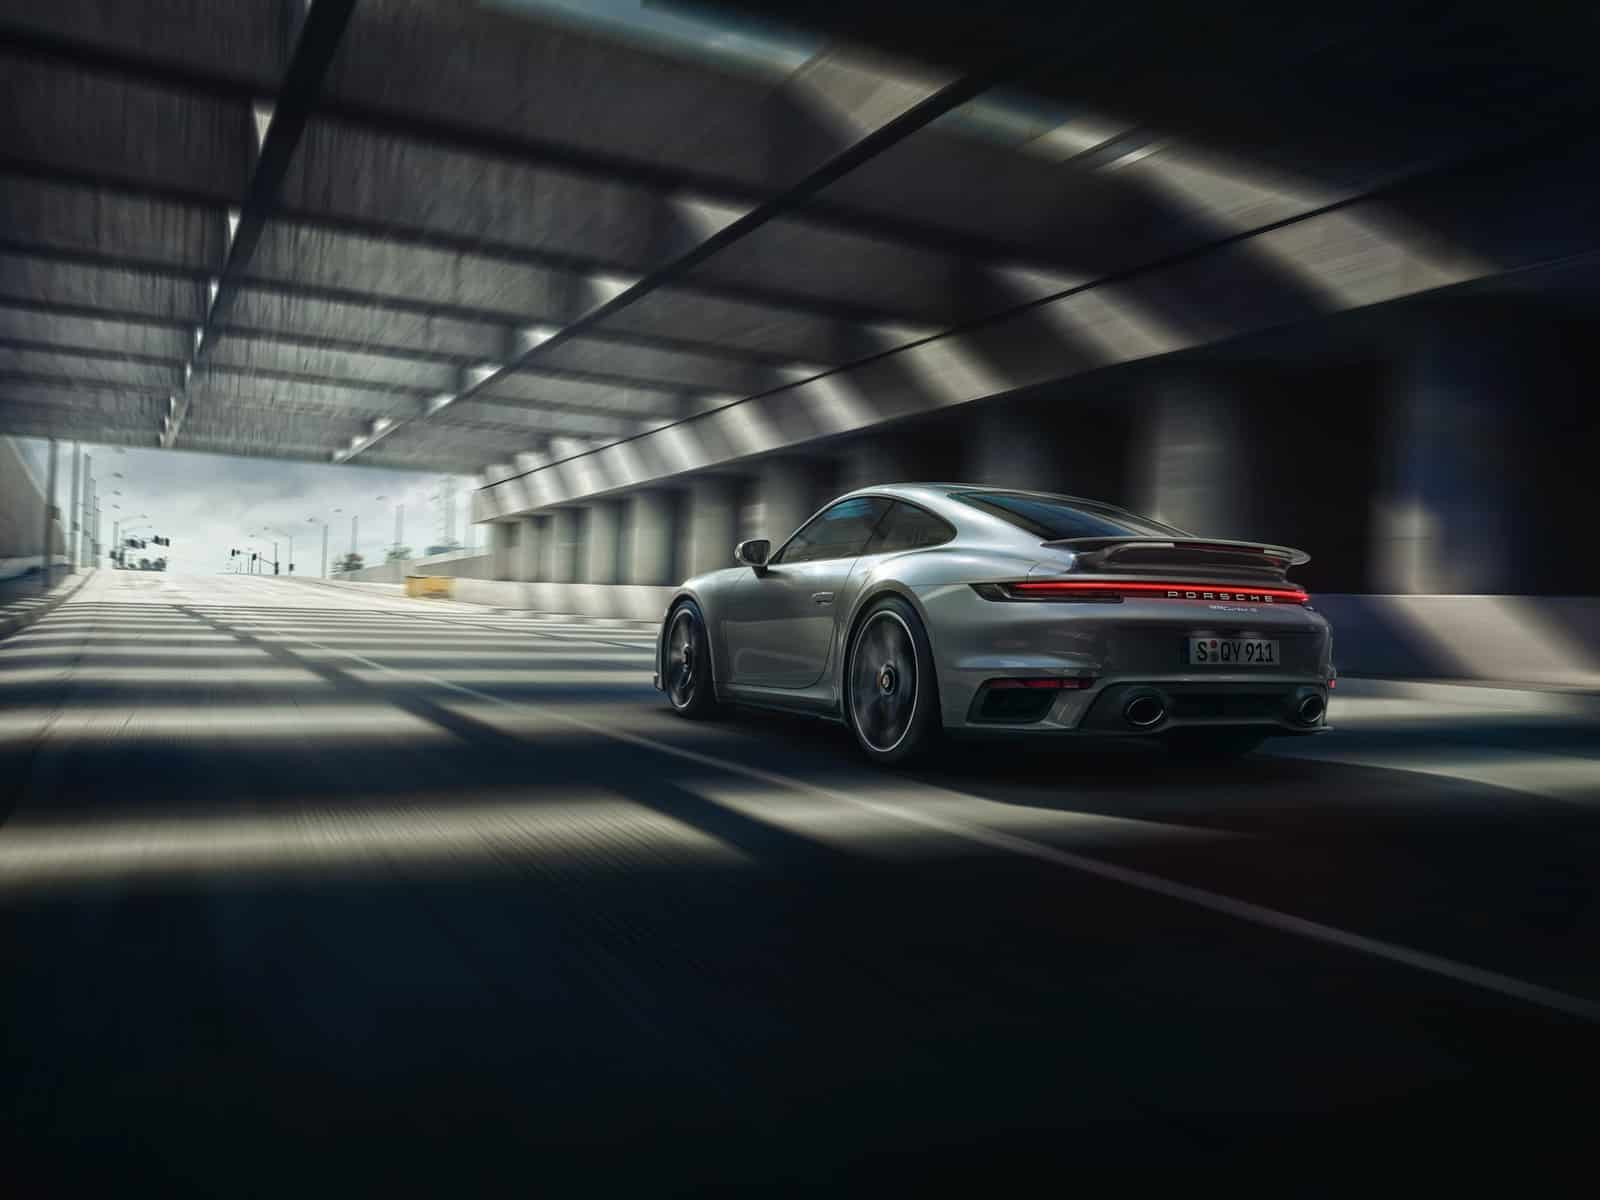 2021 Porsche 911 Turbo S 2